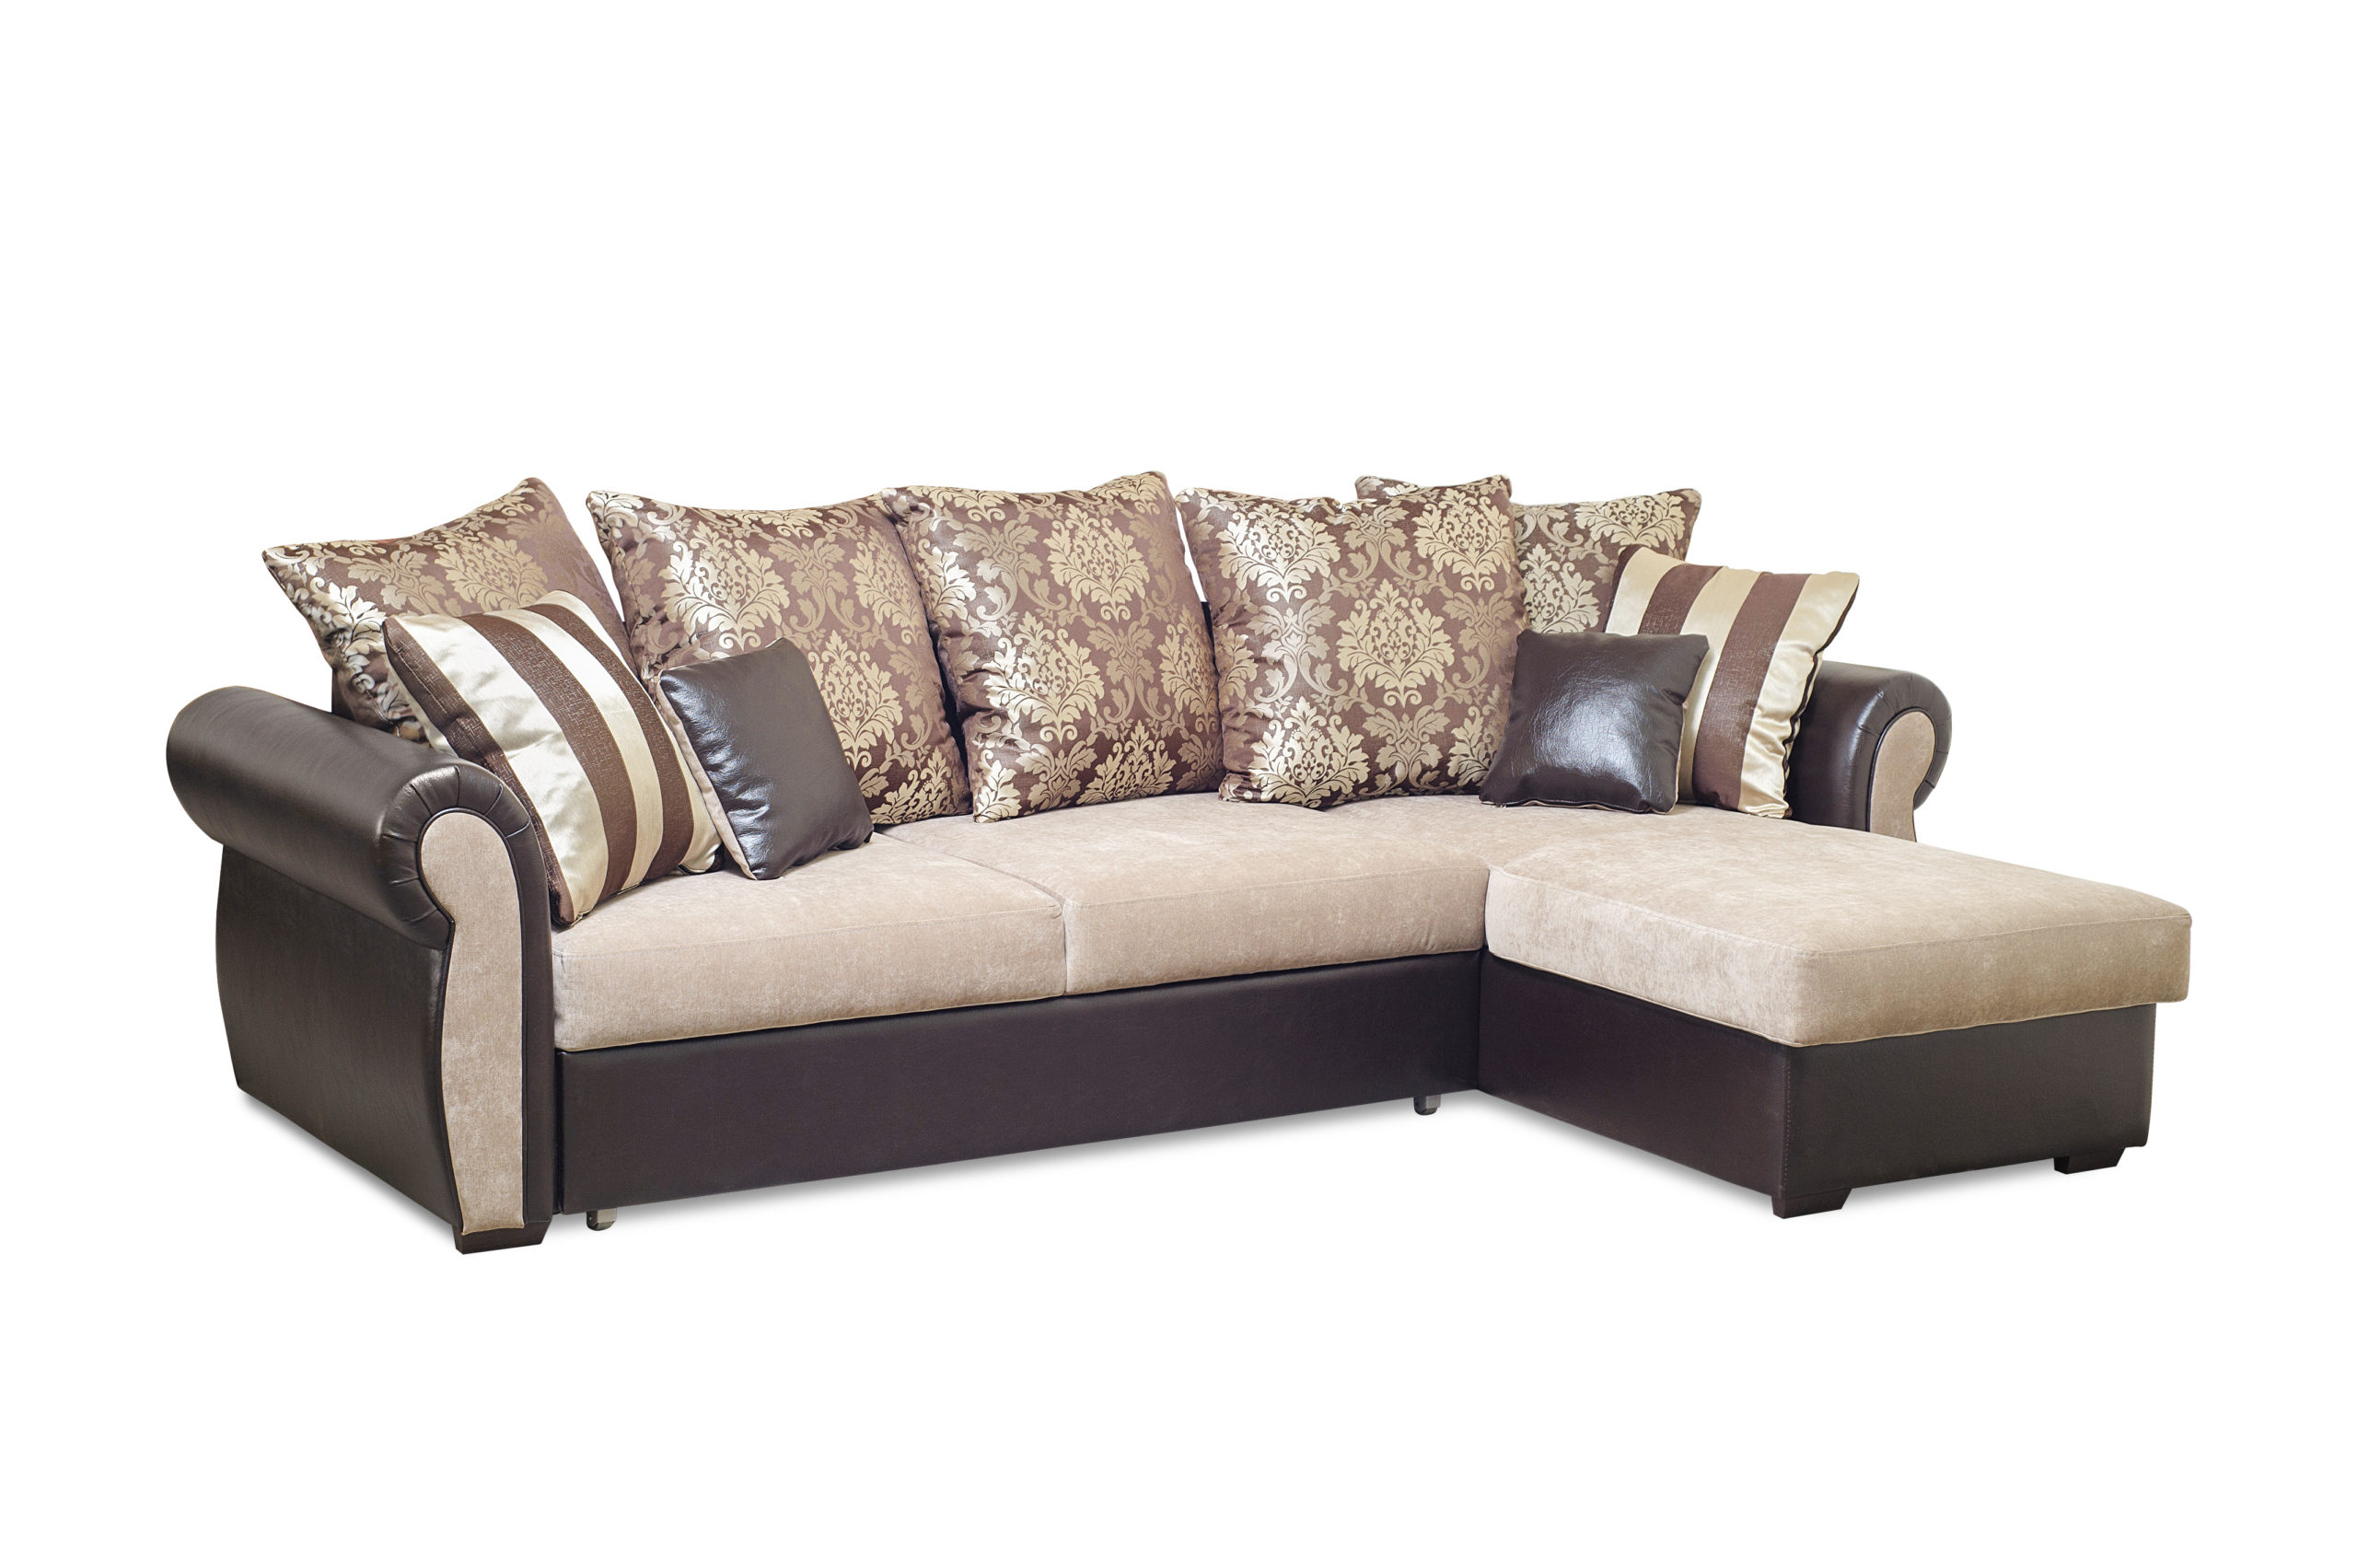 Астра диван угловой.2